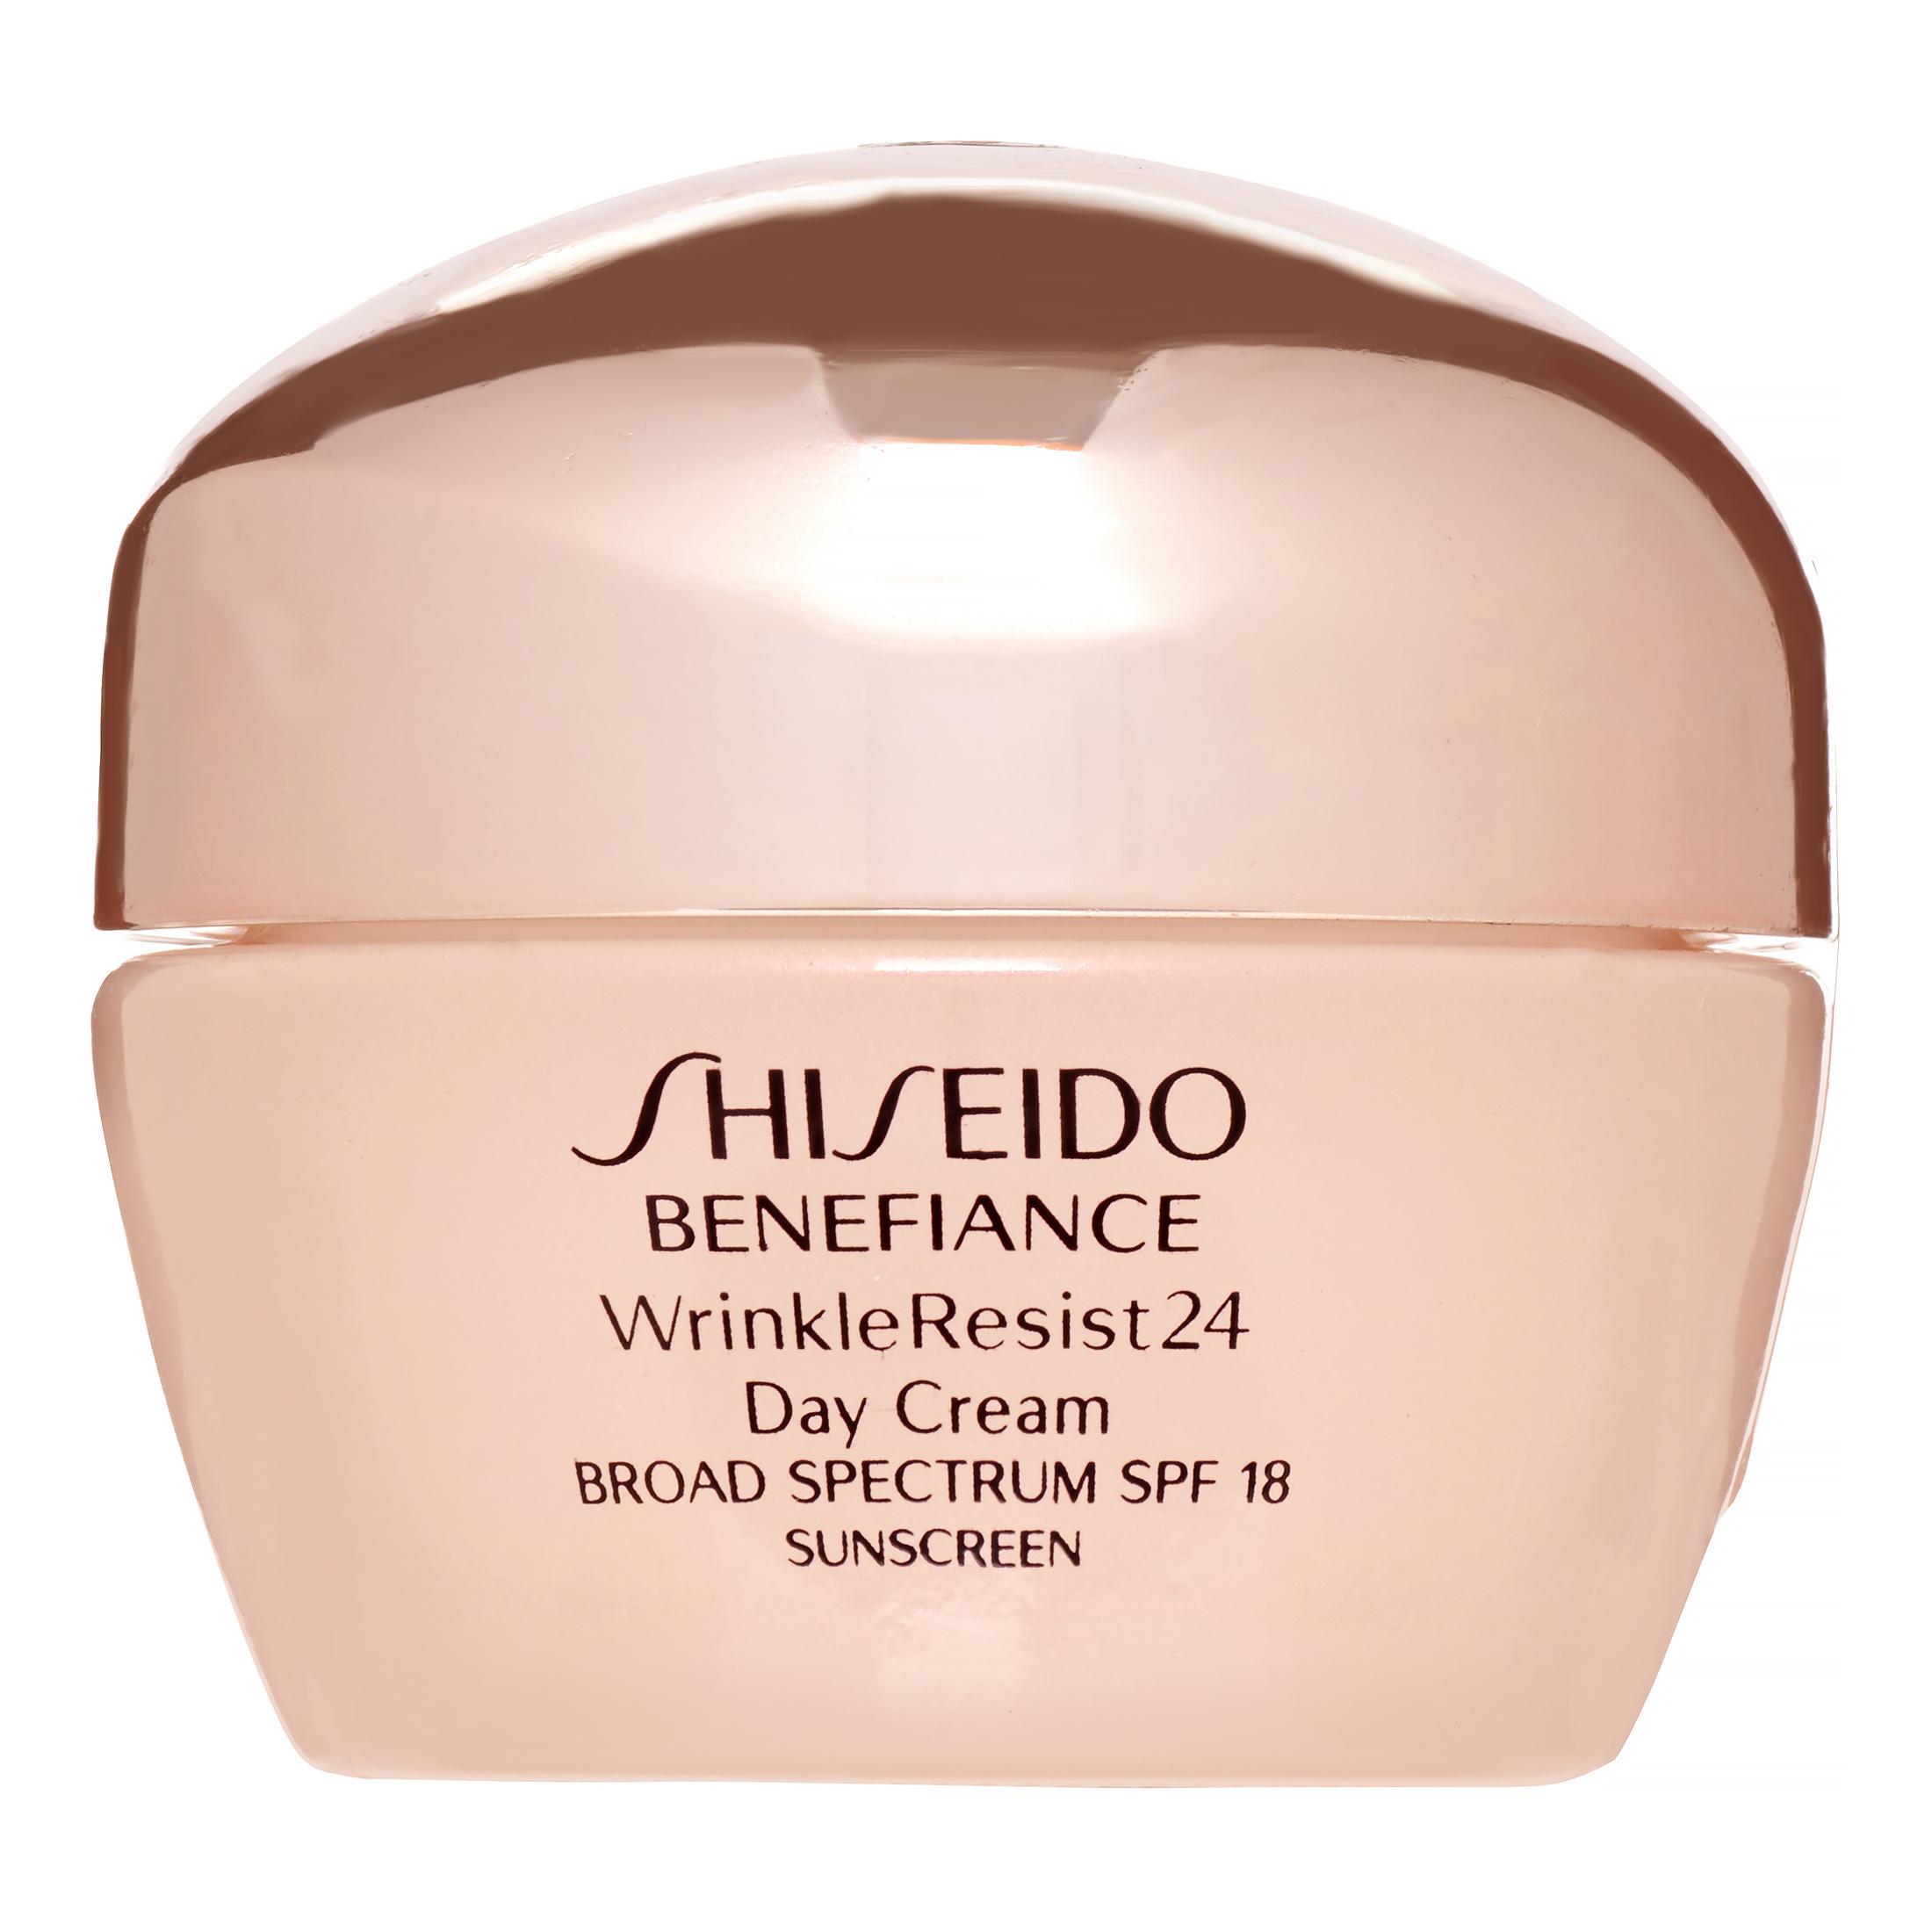 Shiseido Benefiance WrinkleResist24 Day Cream Broad Spectrum 18